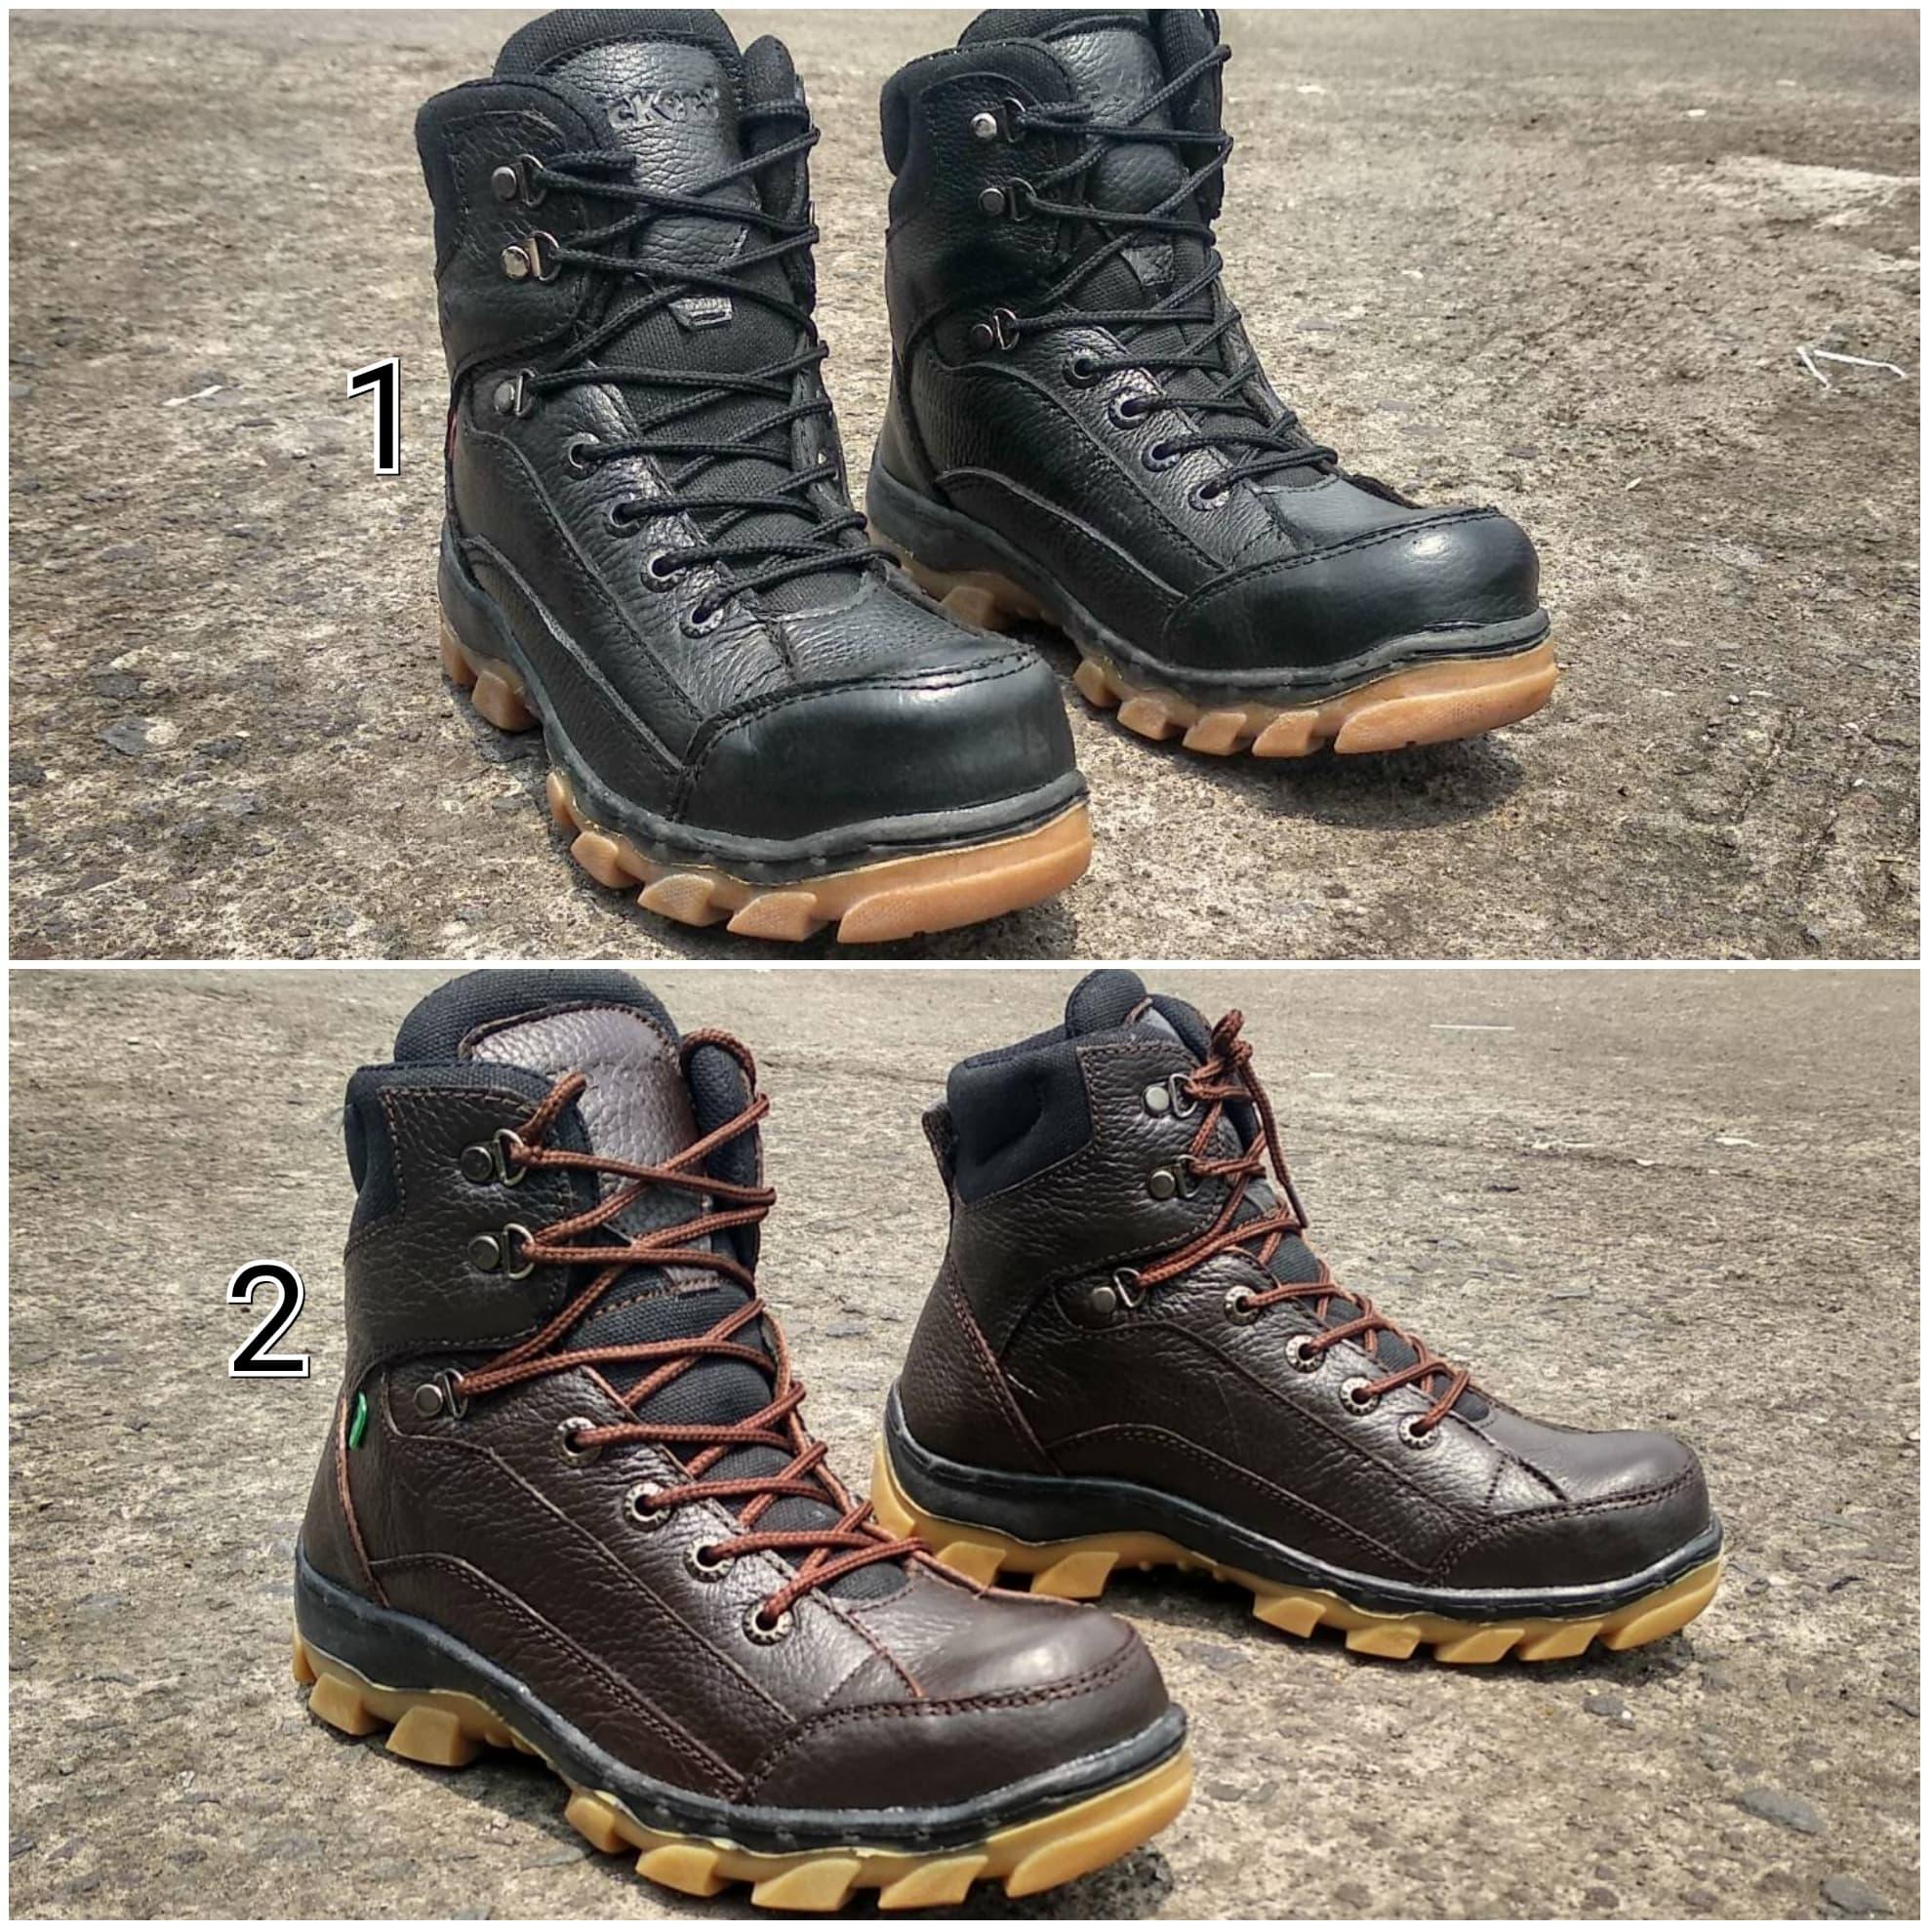 MURAH Sepatu Kickers Tracking Kulit Asli Safety Ujung Besi Boots Pria 051b448ce7